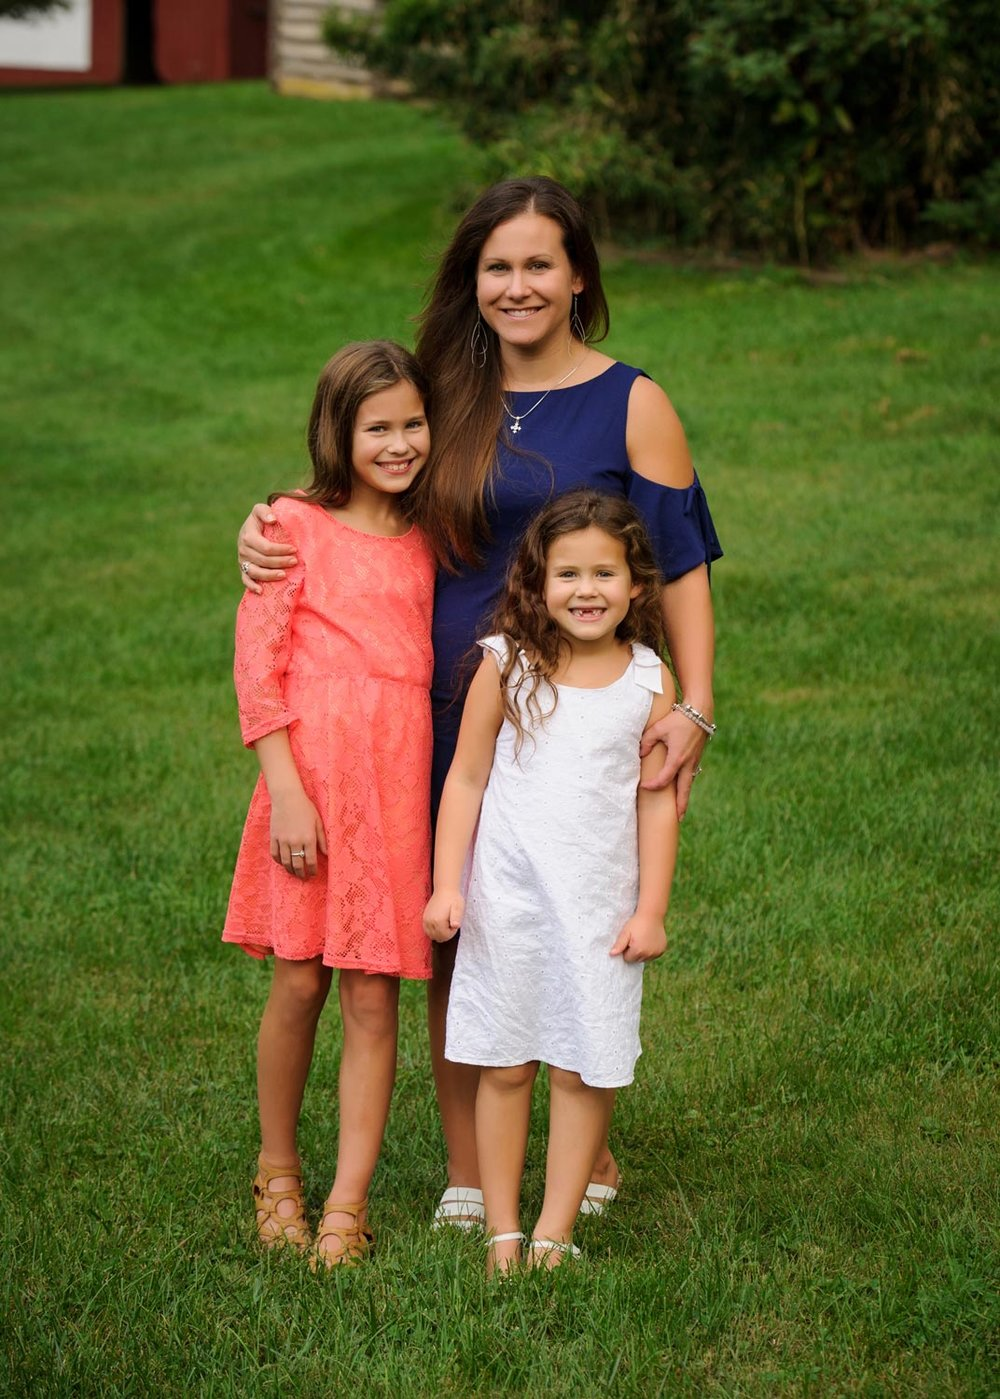 family-photography-Lexington-ky-studio-walz047.jpg